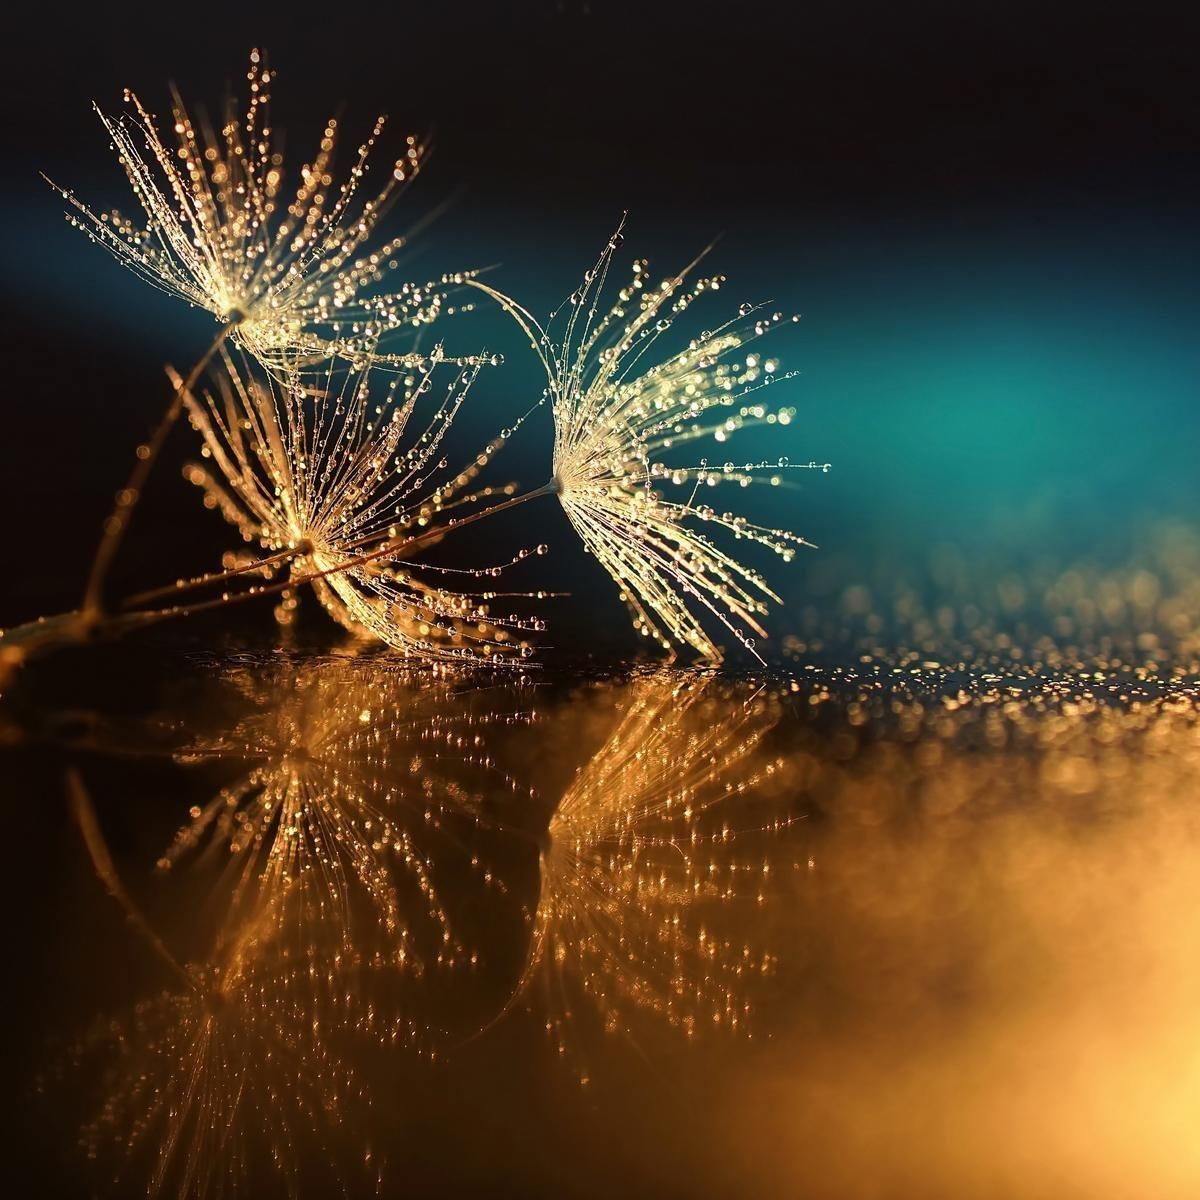 EUROGRAPHICS Glasbild »Dandelion Seeds«, 50/50 cm | Dekoration > Bilder und Rahmen > Bilder | Glas | EUROGRAPHICS